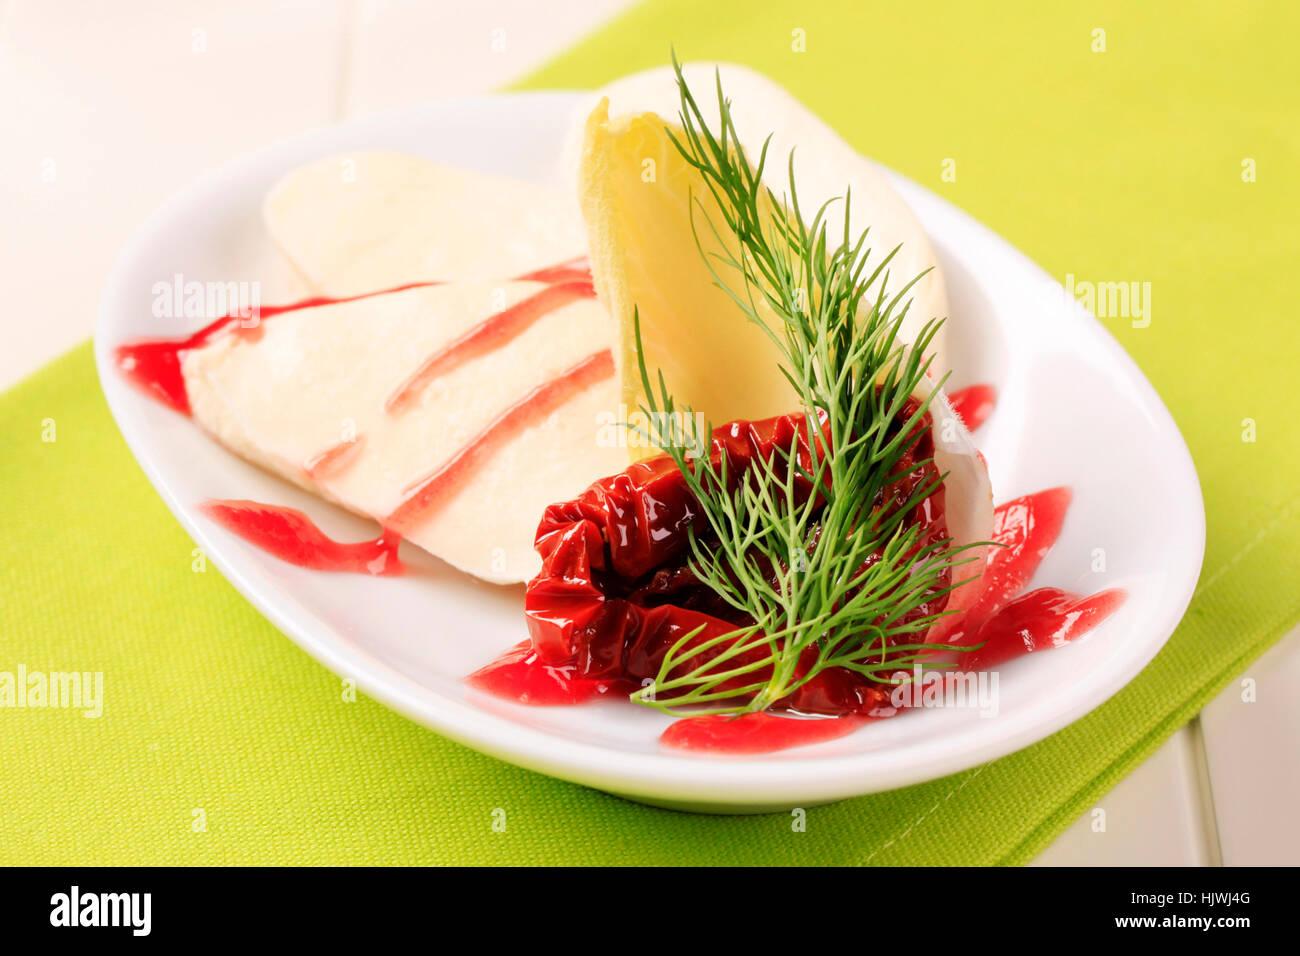 vegetarian dairy - Stock Image